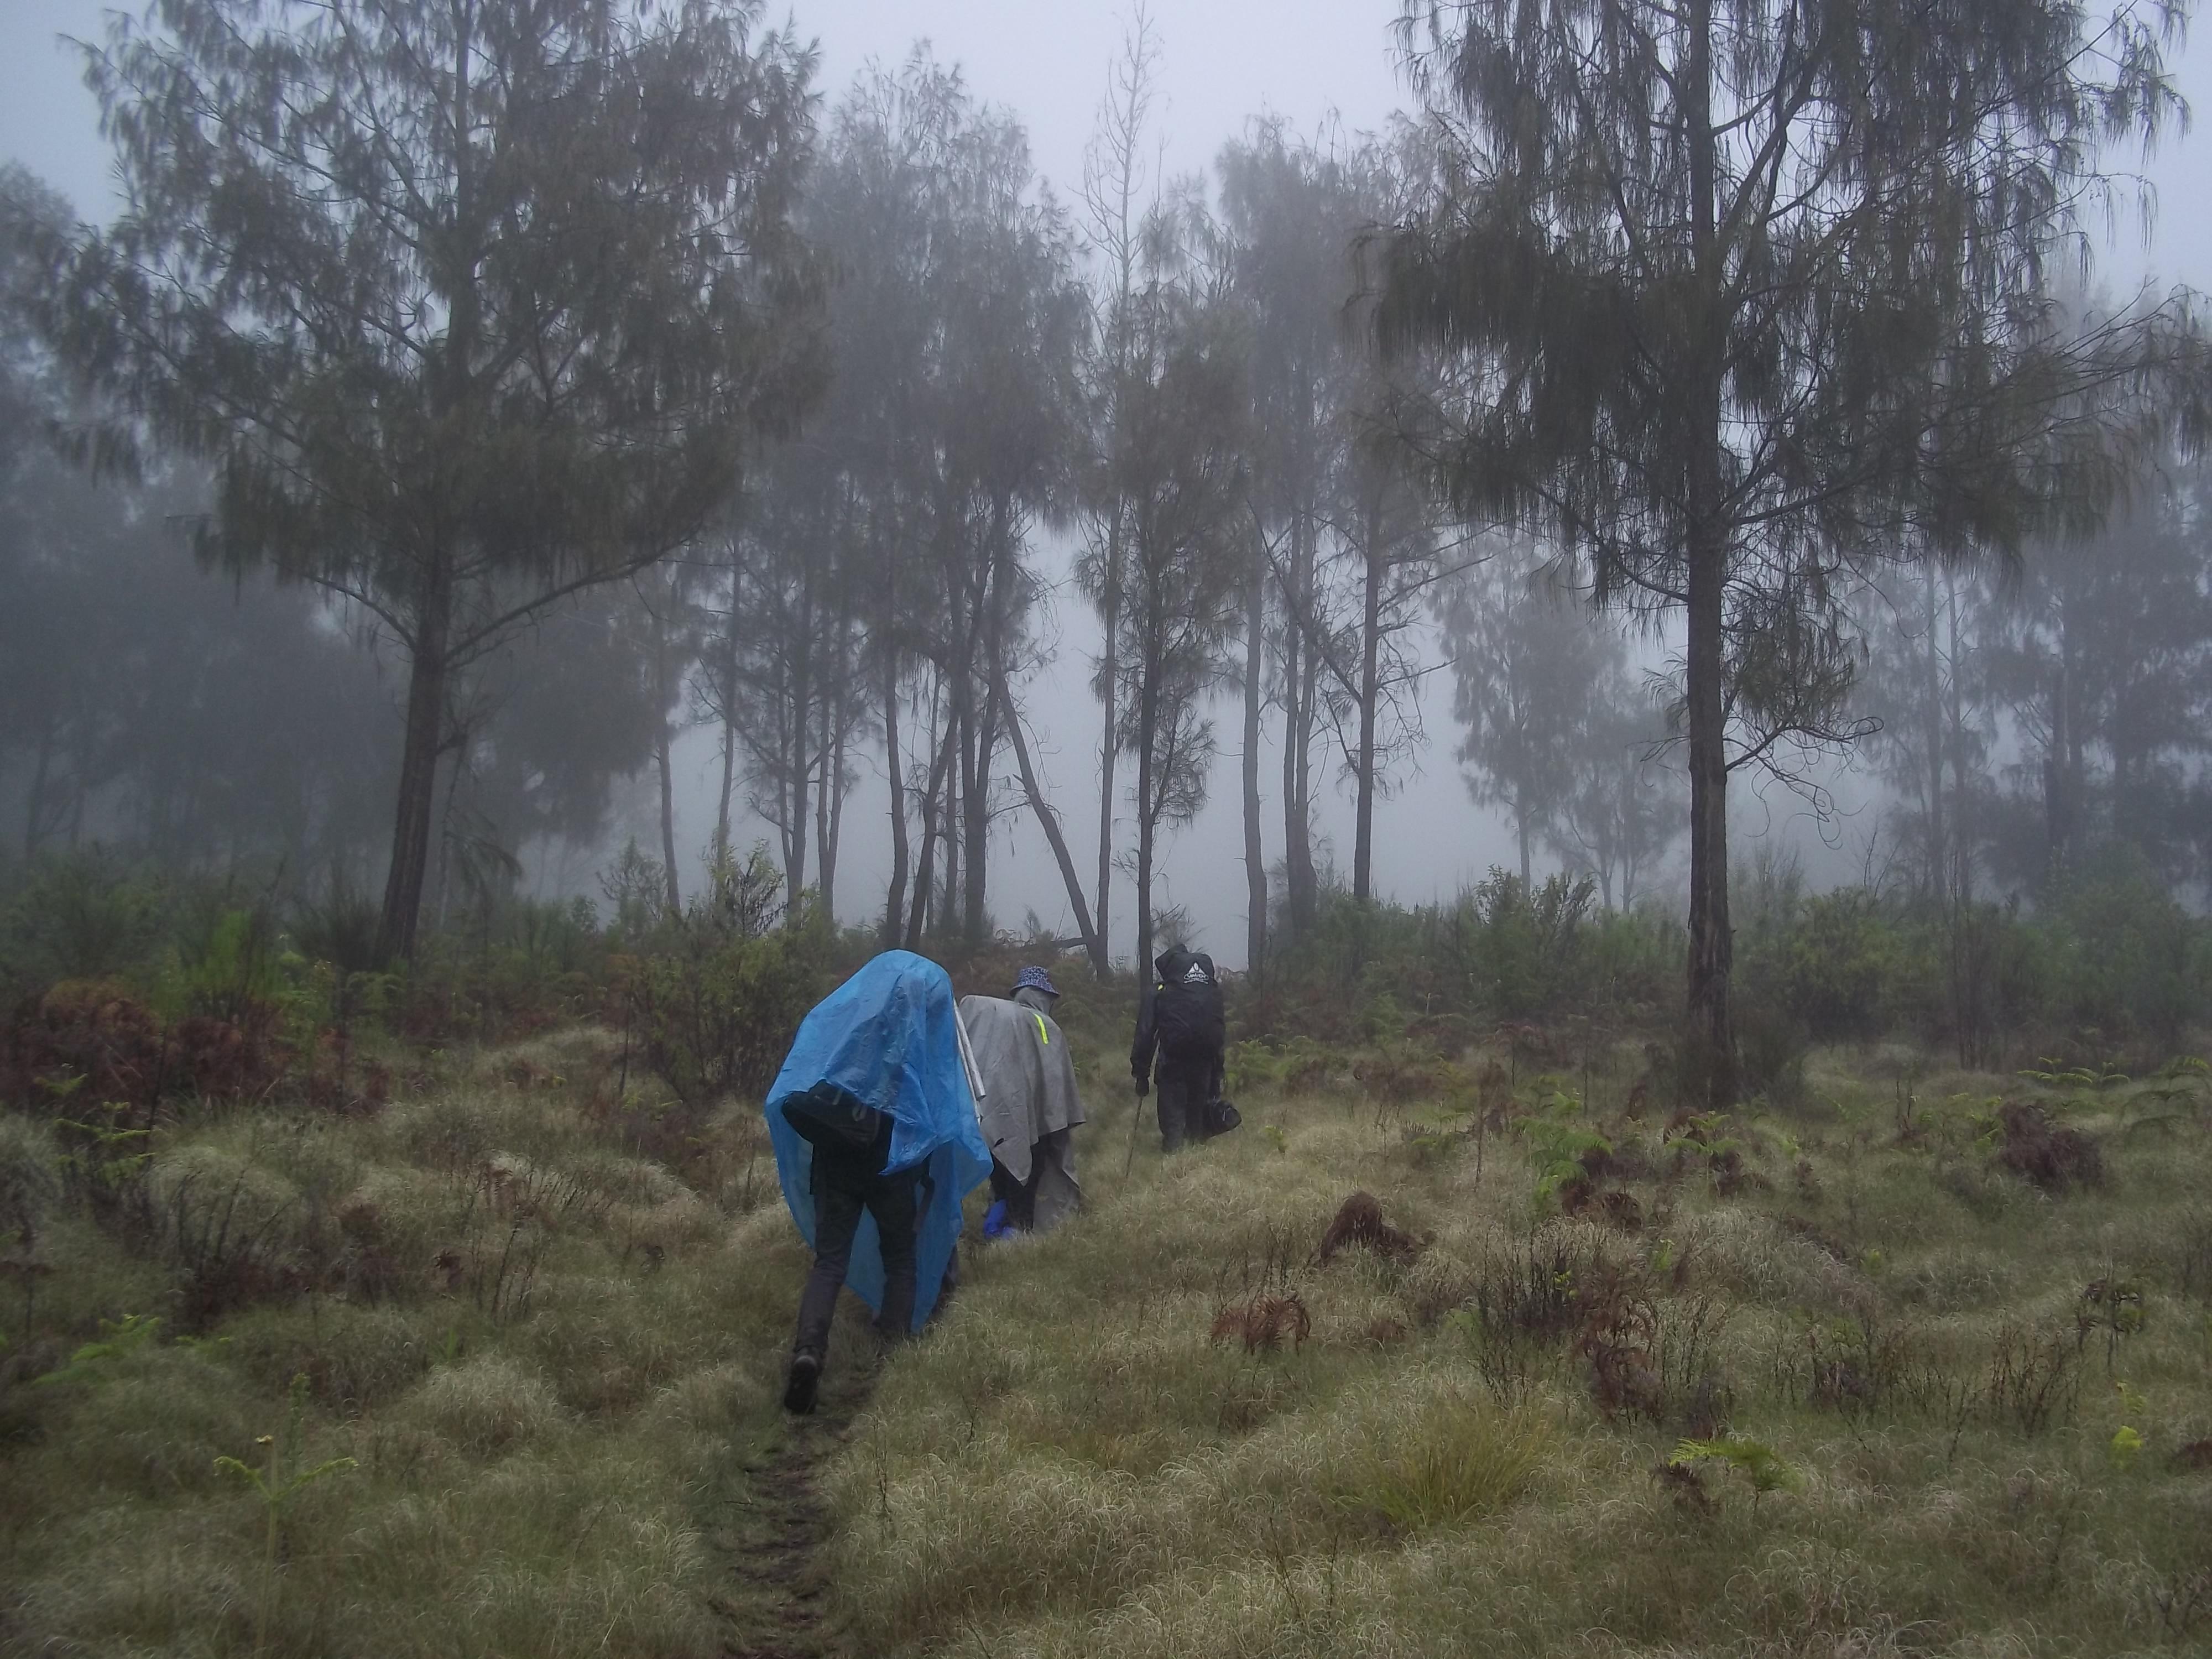 Mencari Firdaus Tersembunyi Argopuro Muhammadhalim22 Gunung Kawasan Wisata Tingkat Adventure